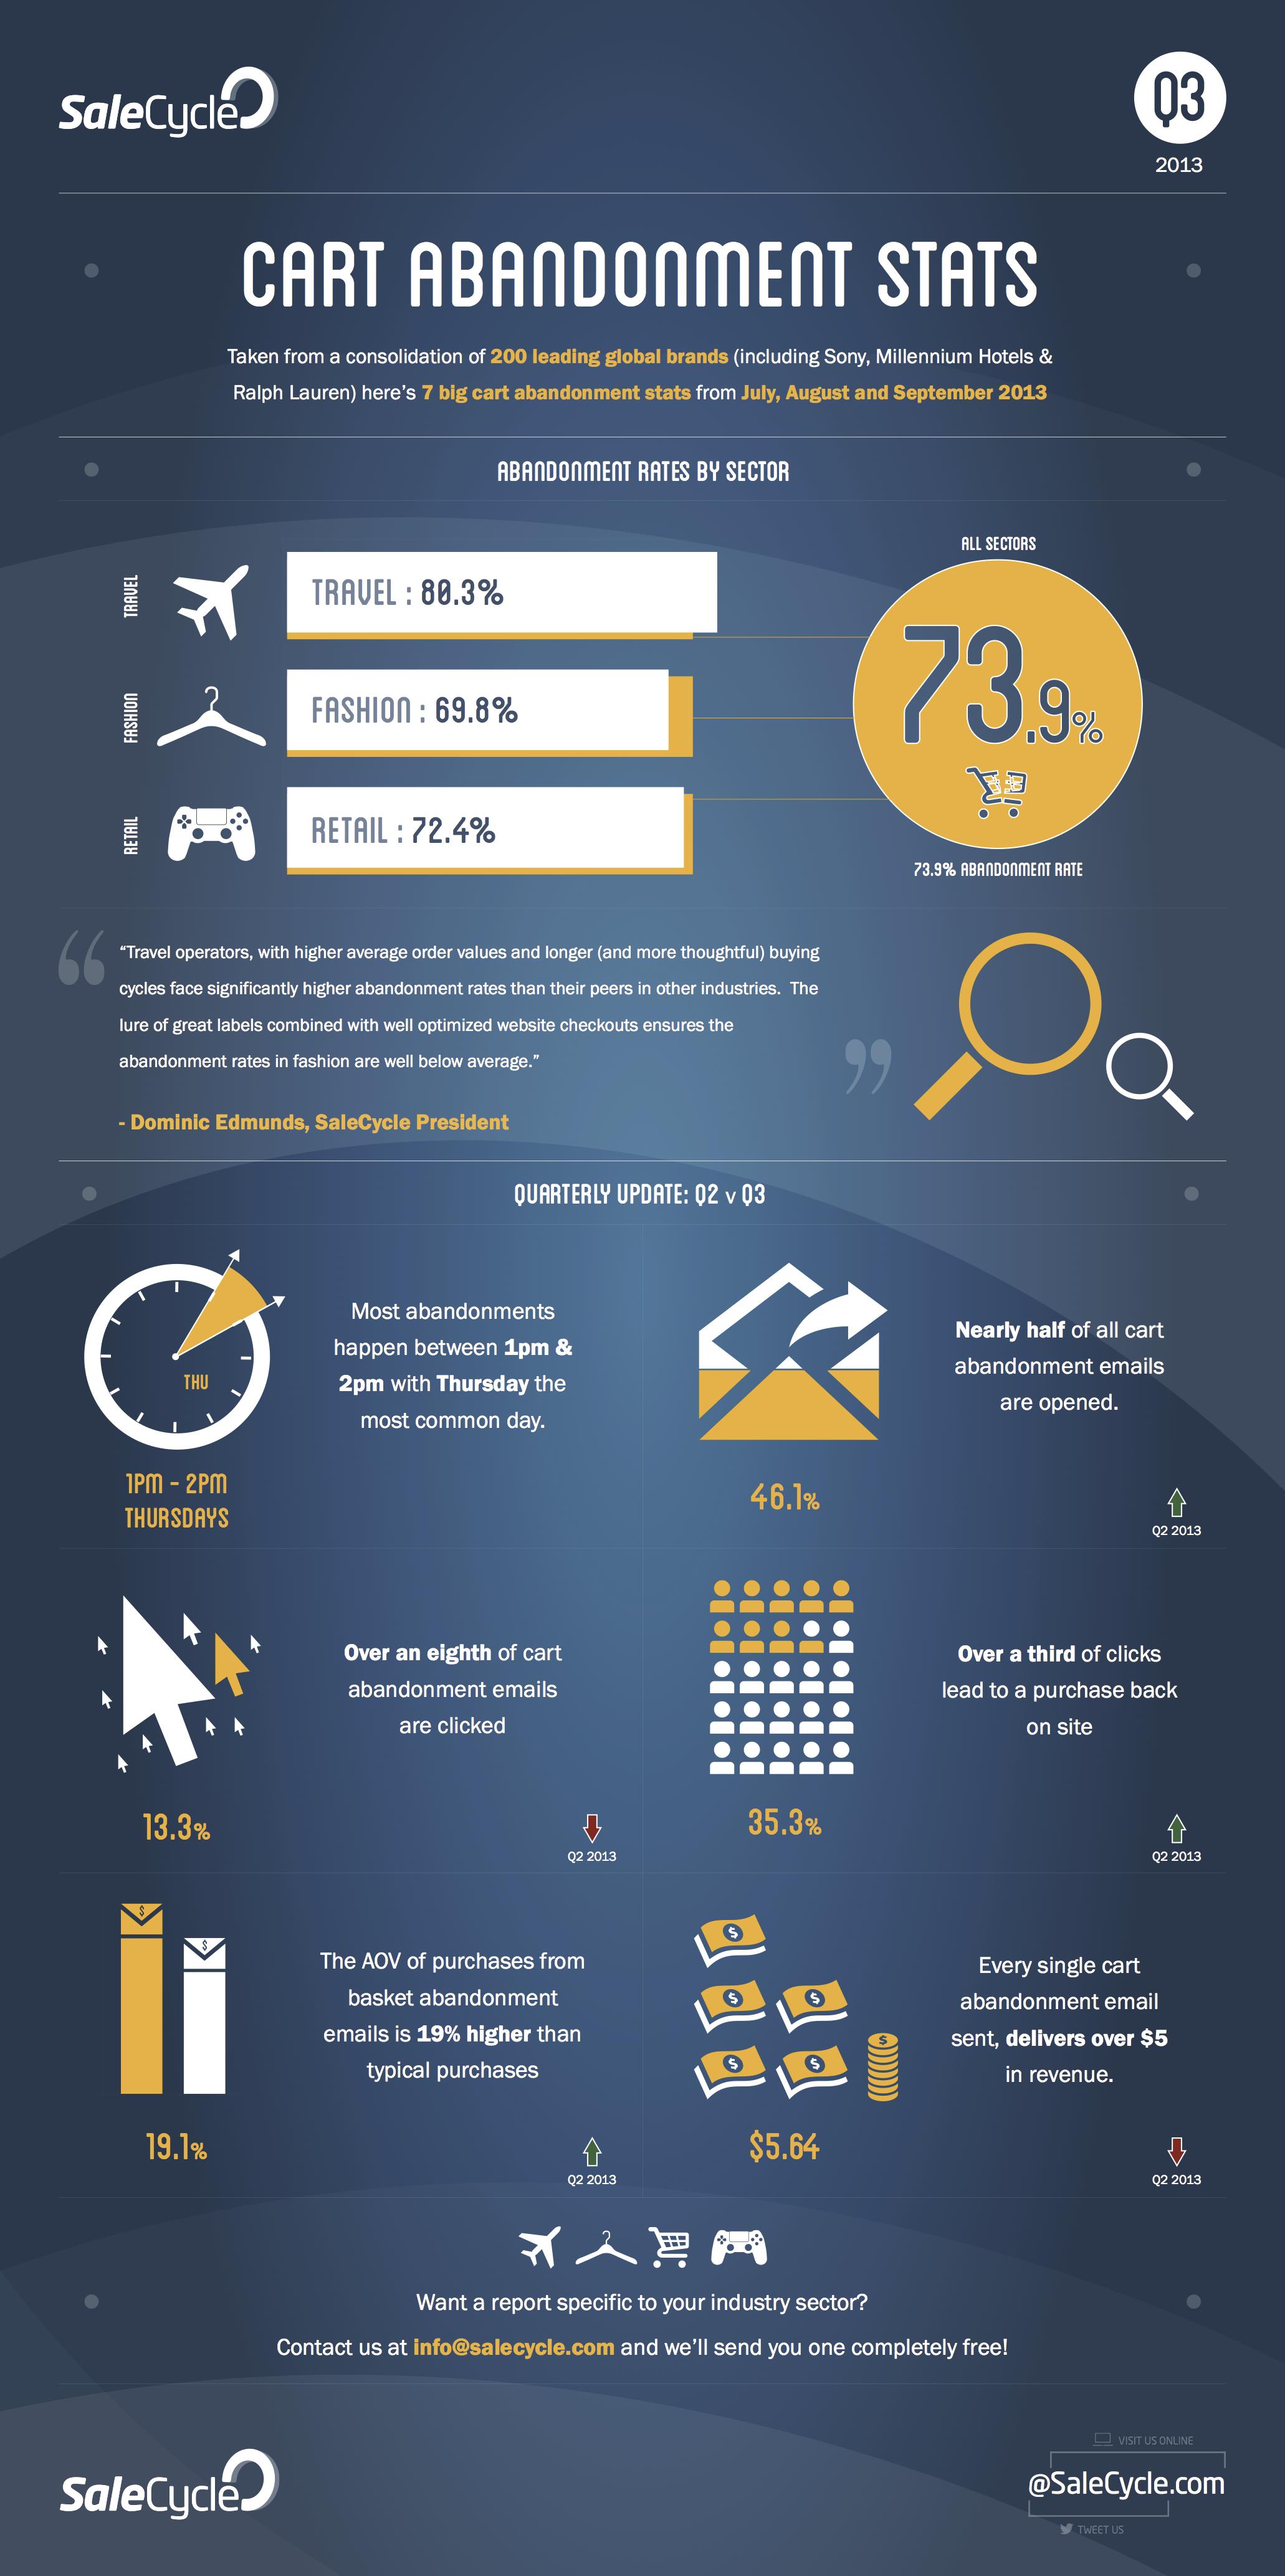 Infographic: Cart Abandonment Stats - Q3 2013